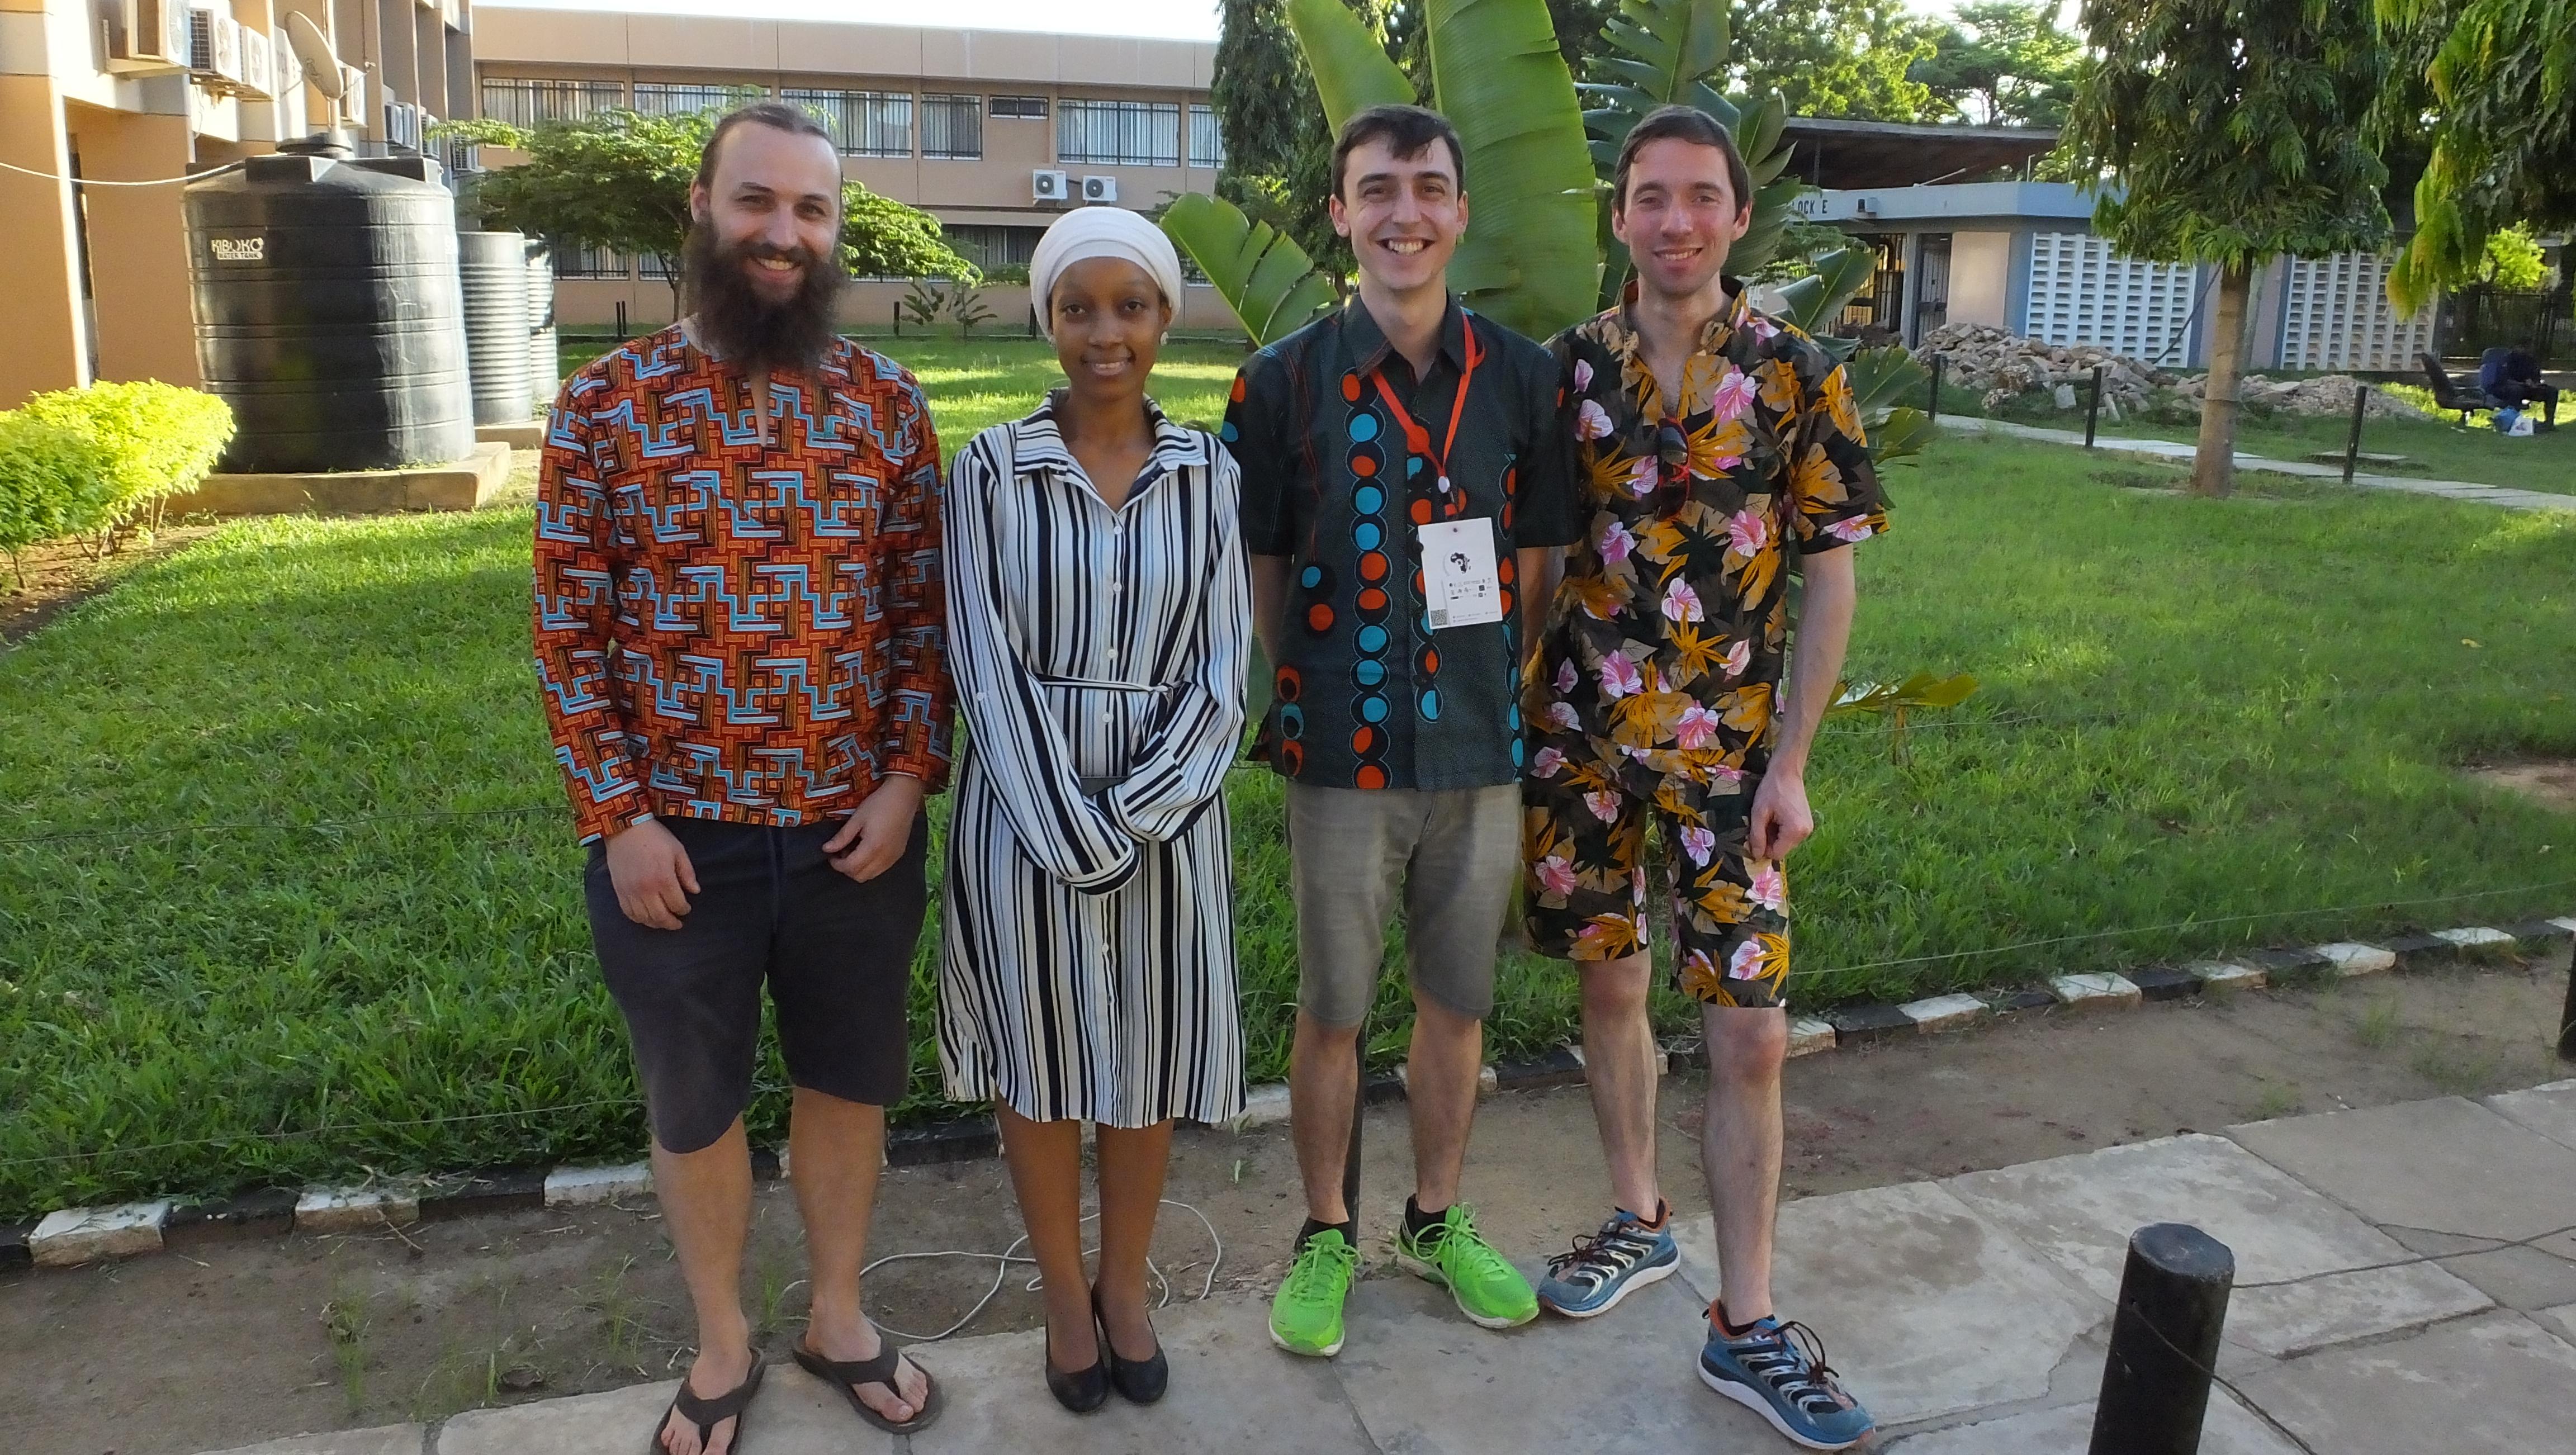 Dr Julian Stirling, Joel Collins and Dr Richard Bowman with Dr Christine Mwase, in Dar es Salaam